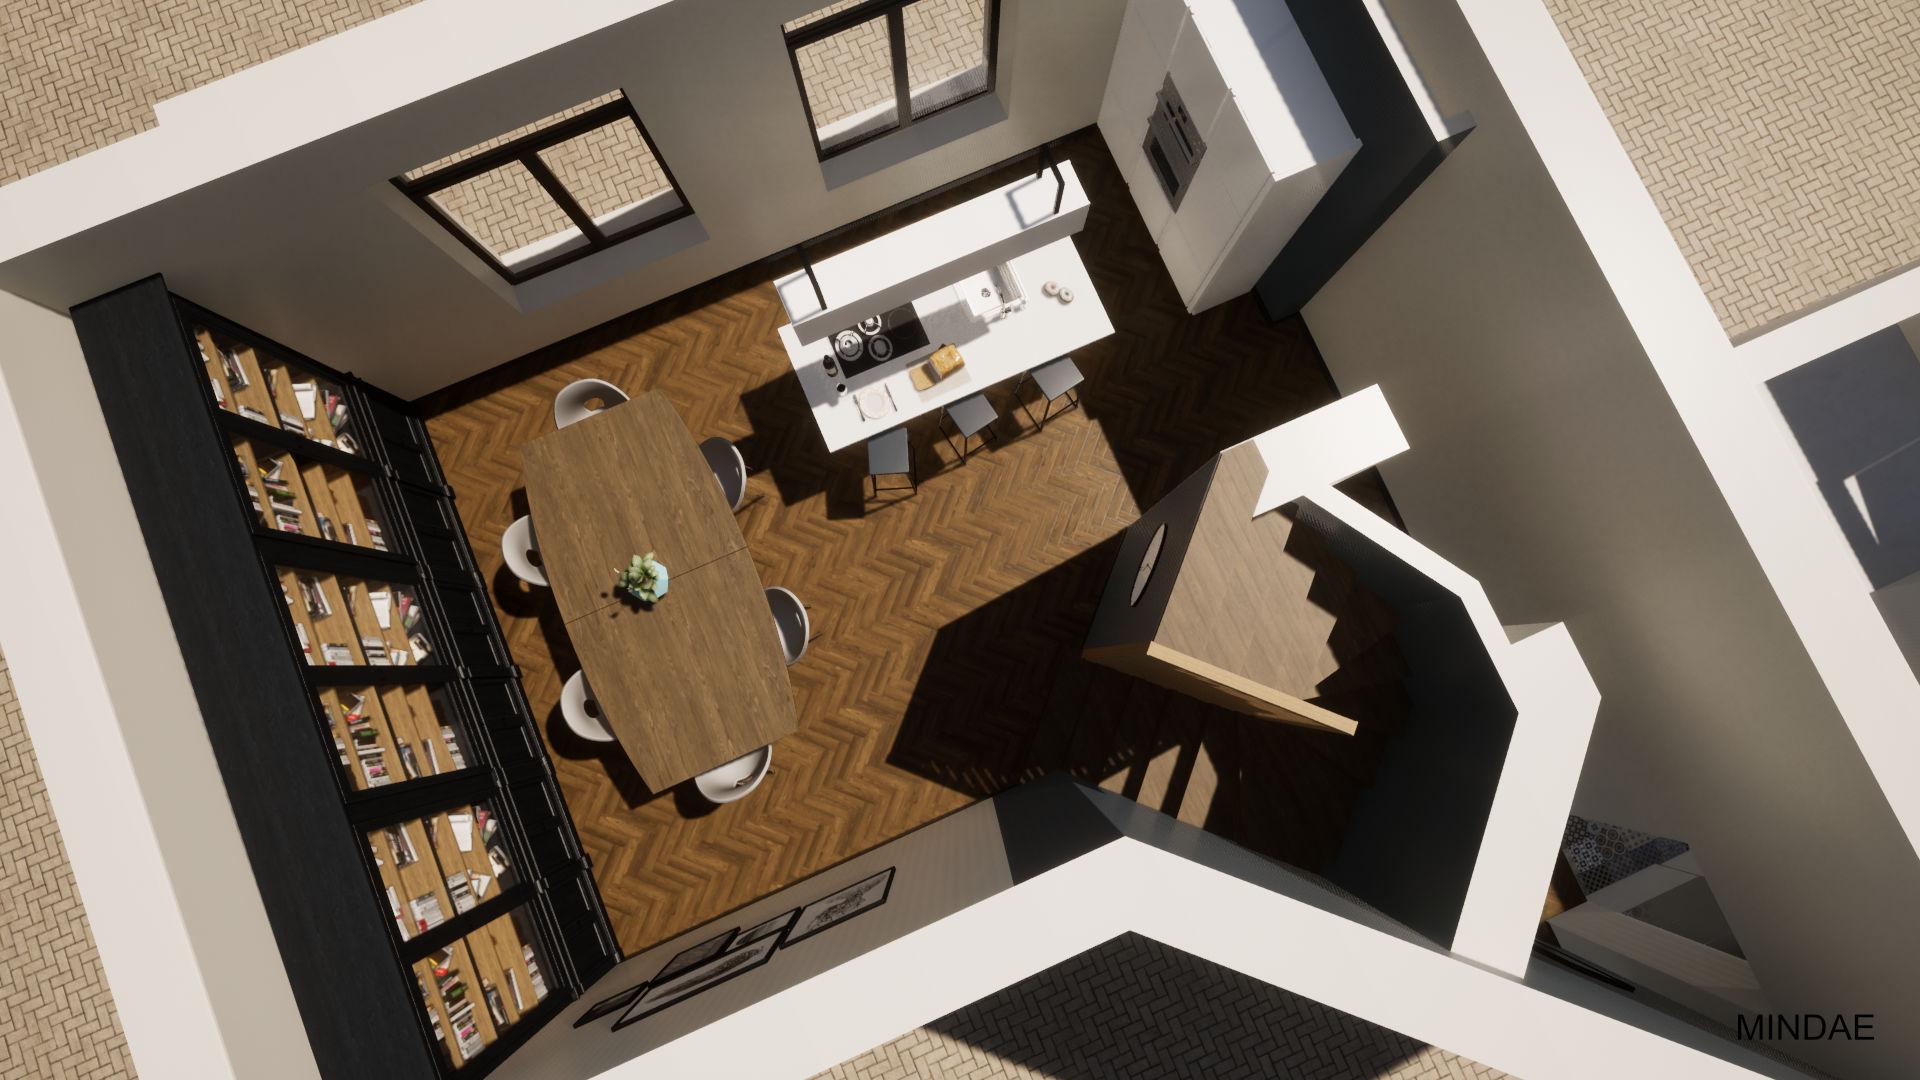 Mindae_Charleroi_Triplex_salle à manger_cuisine ouverte_bibliothèque (1)